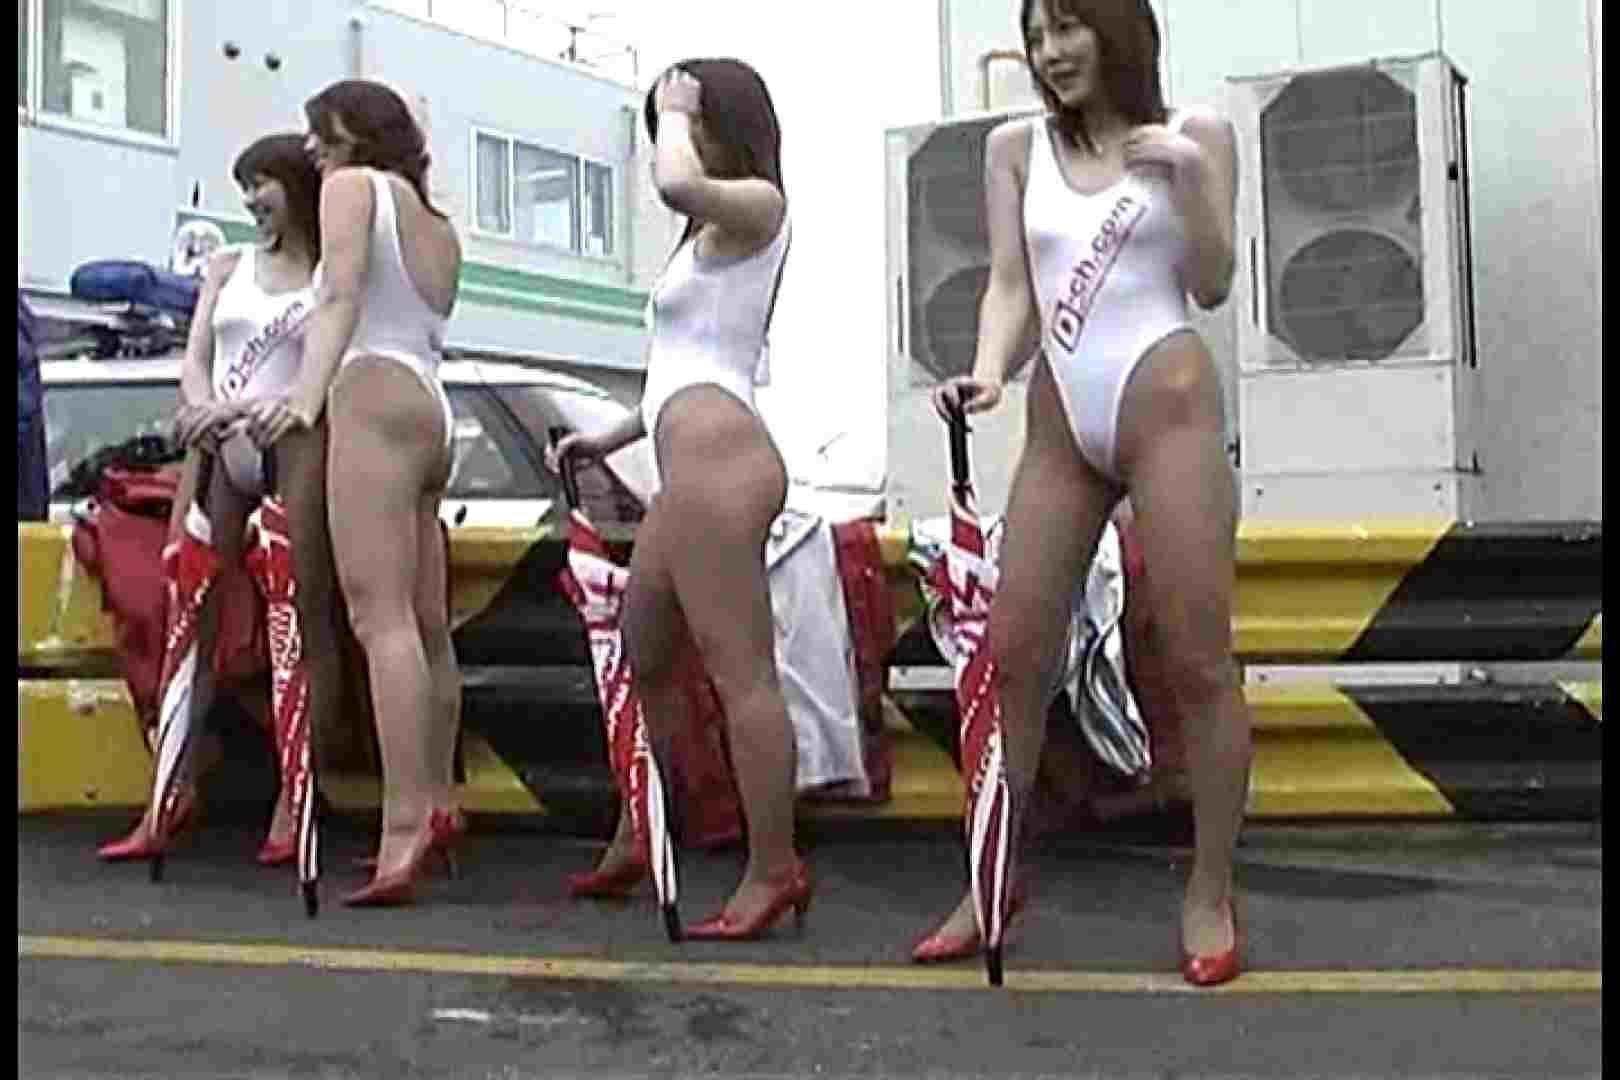 RQカメラ地獄Vol.4 レースクイーン編 盗み撮り動画 64画像 19